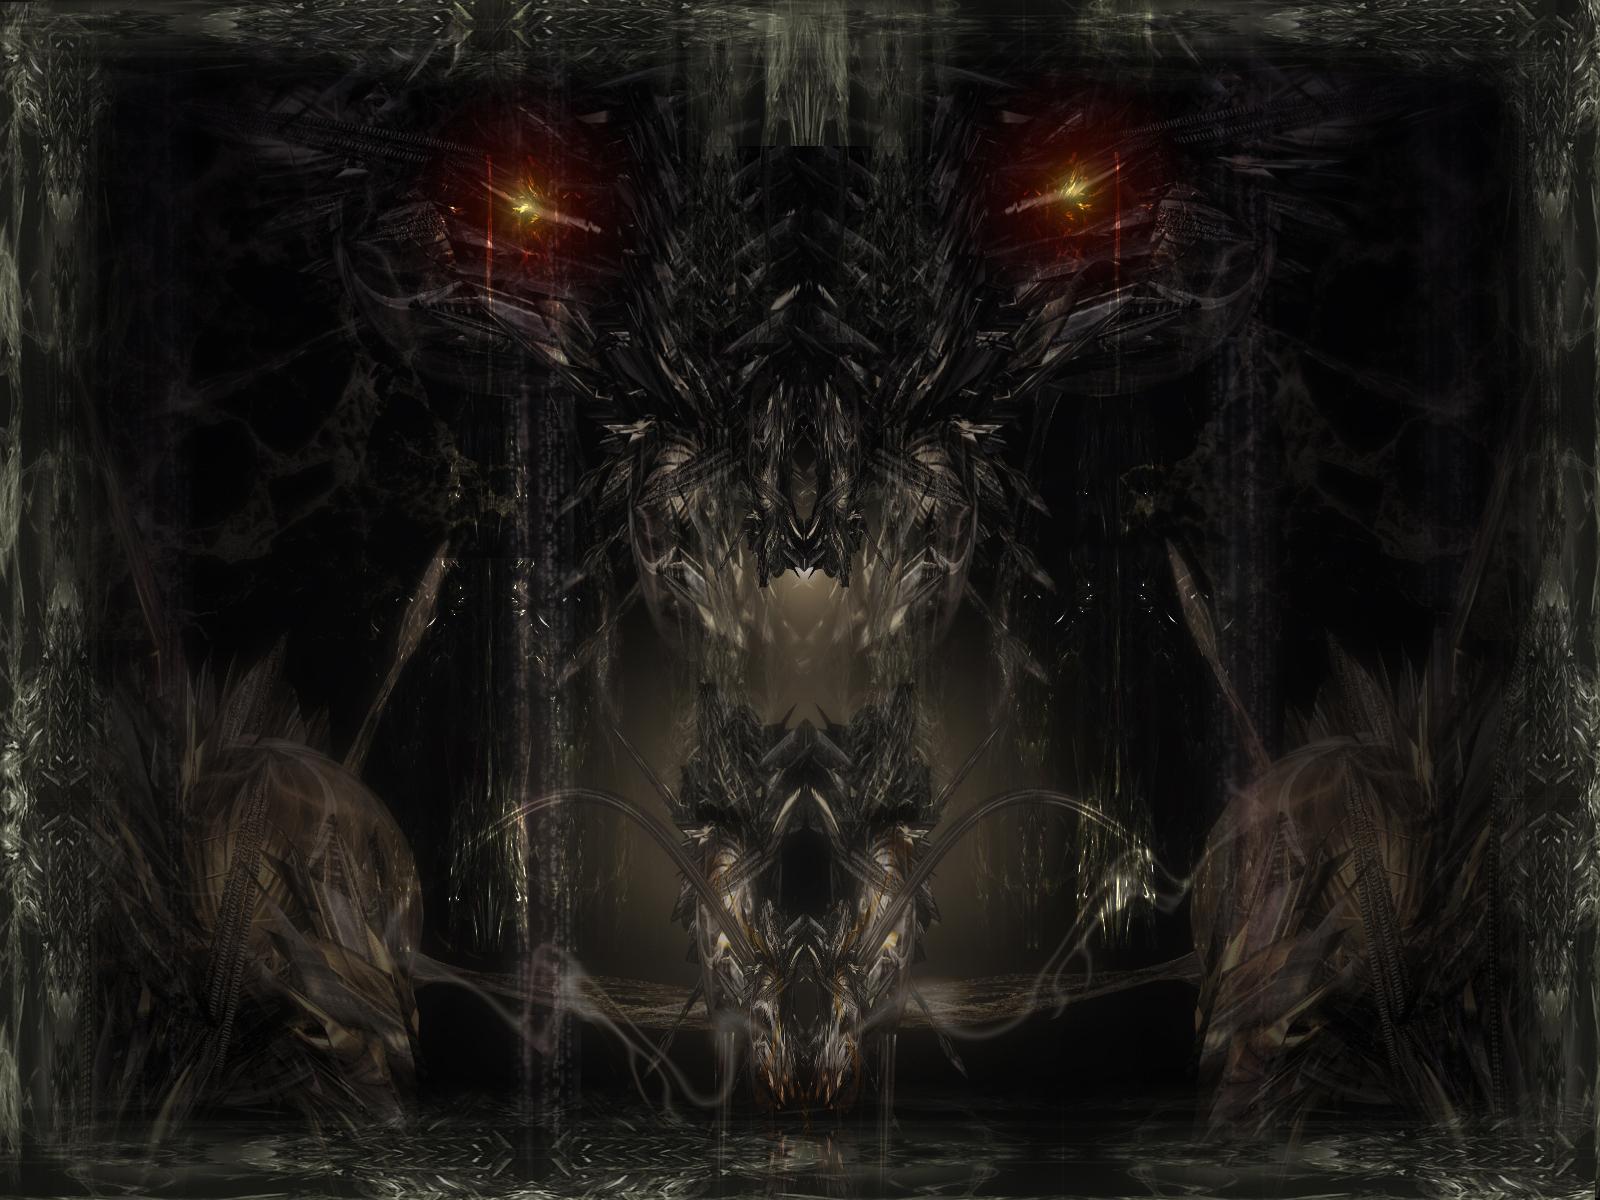 gothic wallpaper   Gothic Wallpaper 4850480 1600x1200